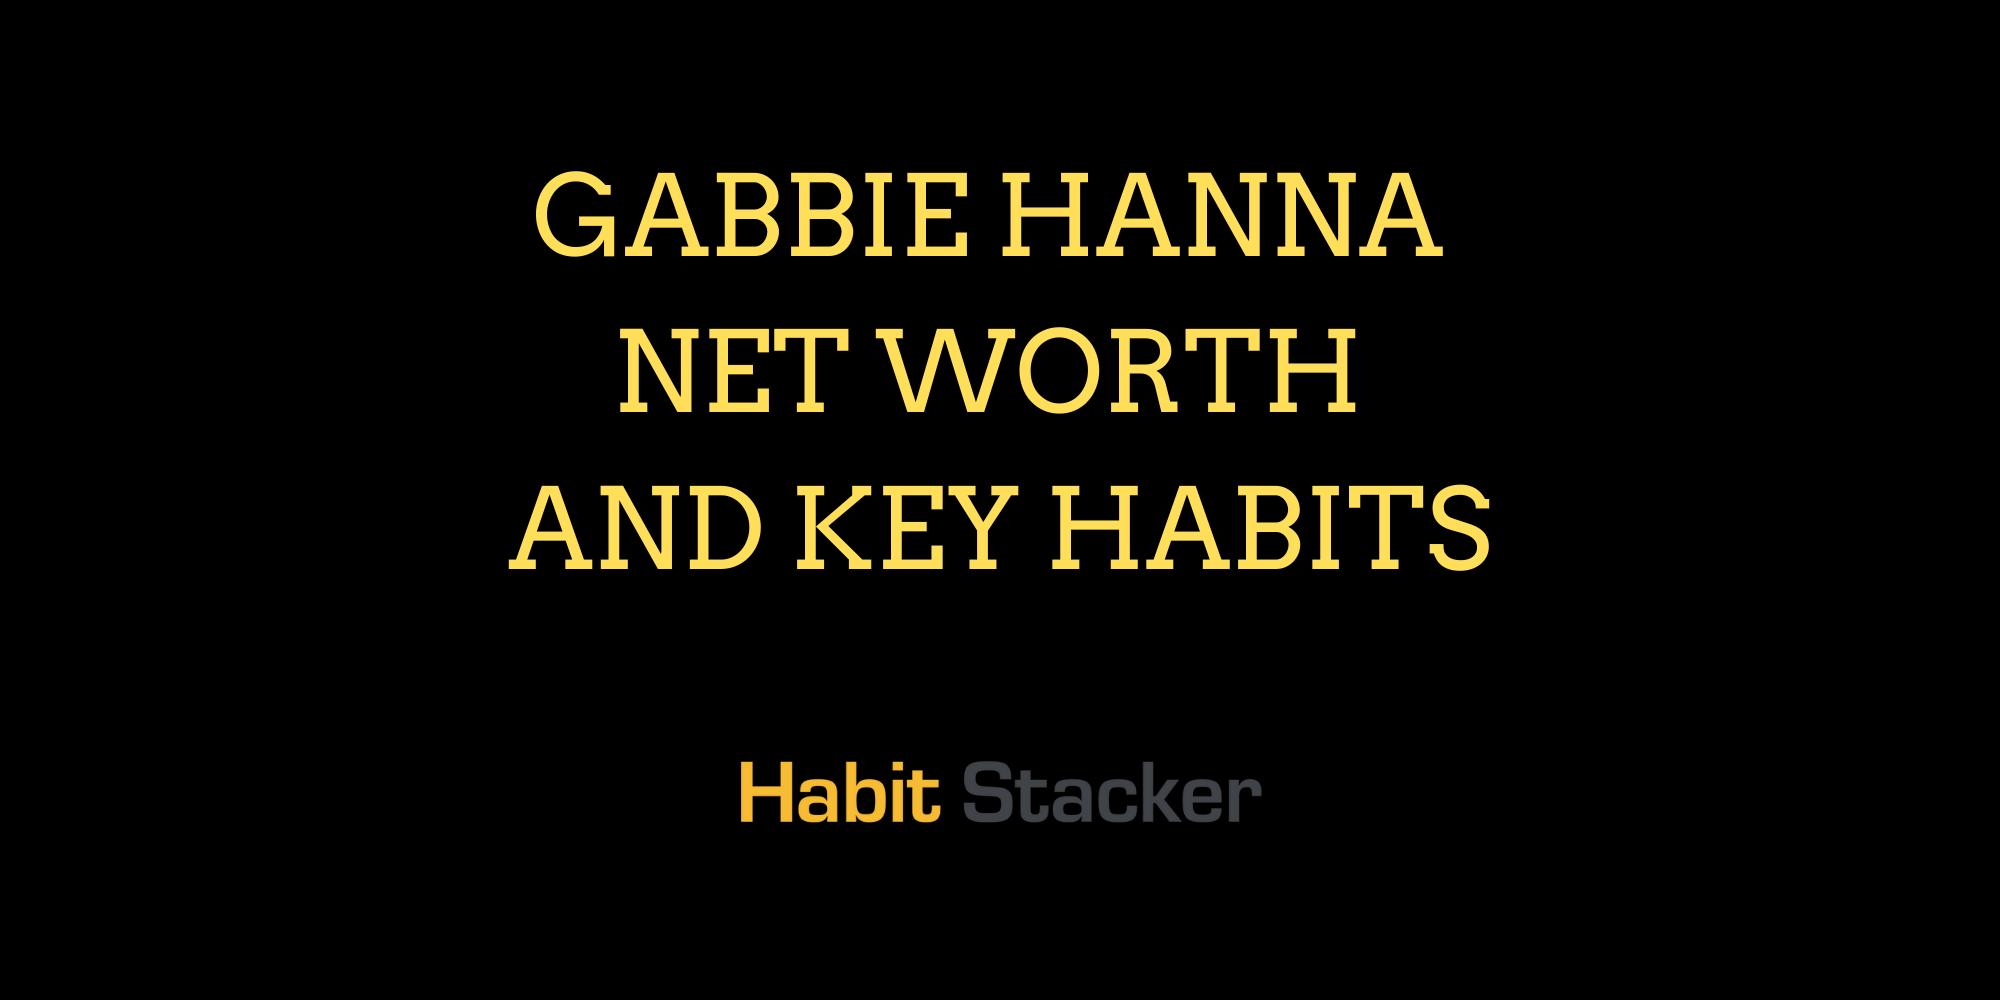 Gabbie Hanna Net Worth and Key Habits